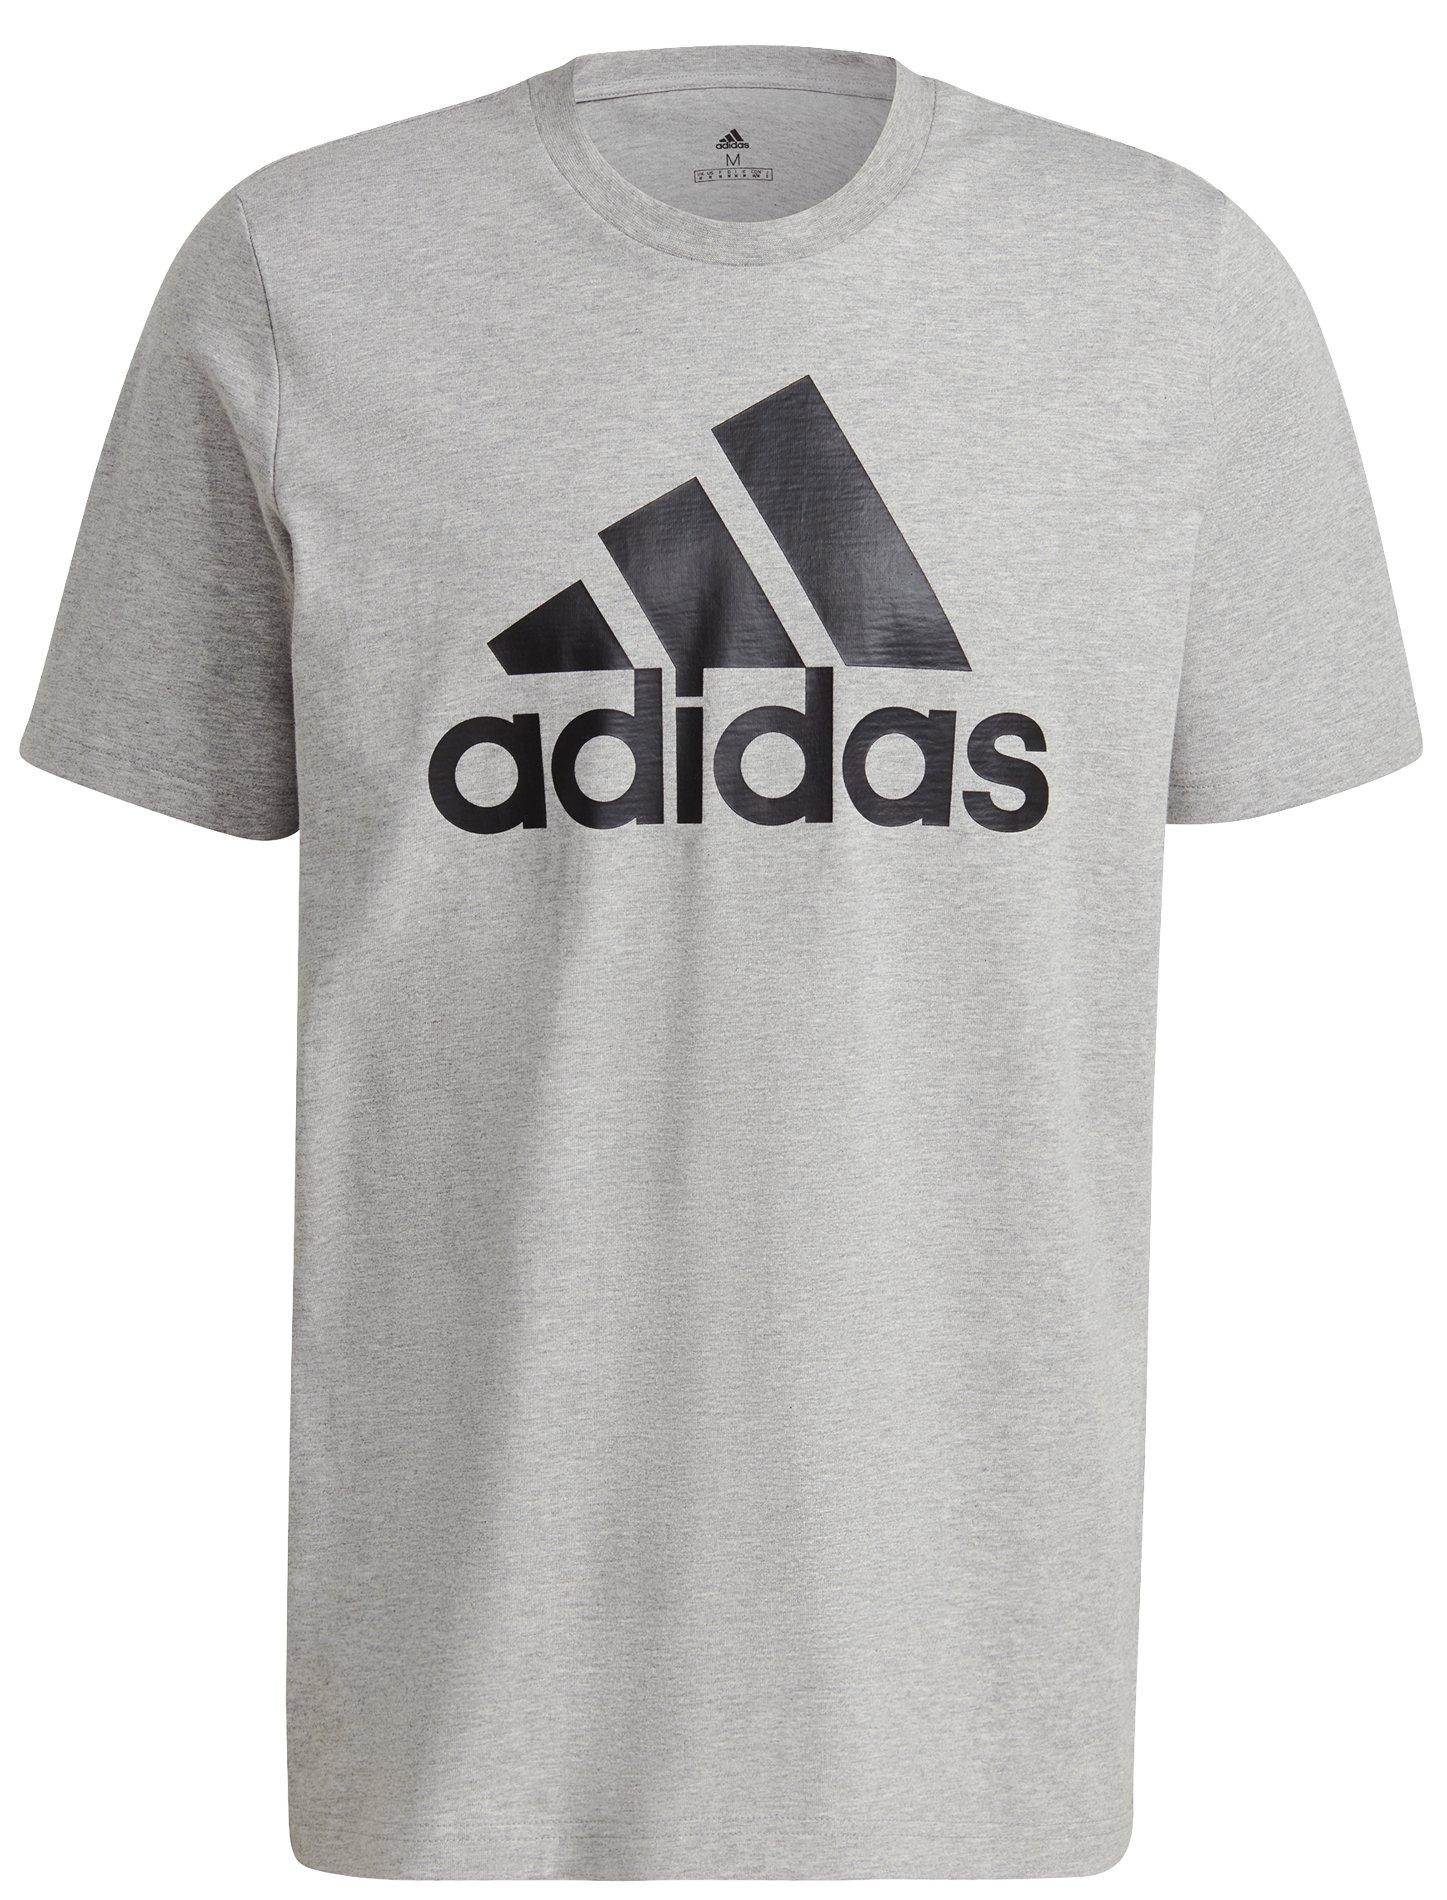 Adidas Essentials Big Logo Tee S